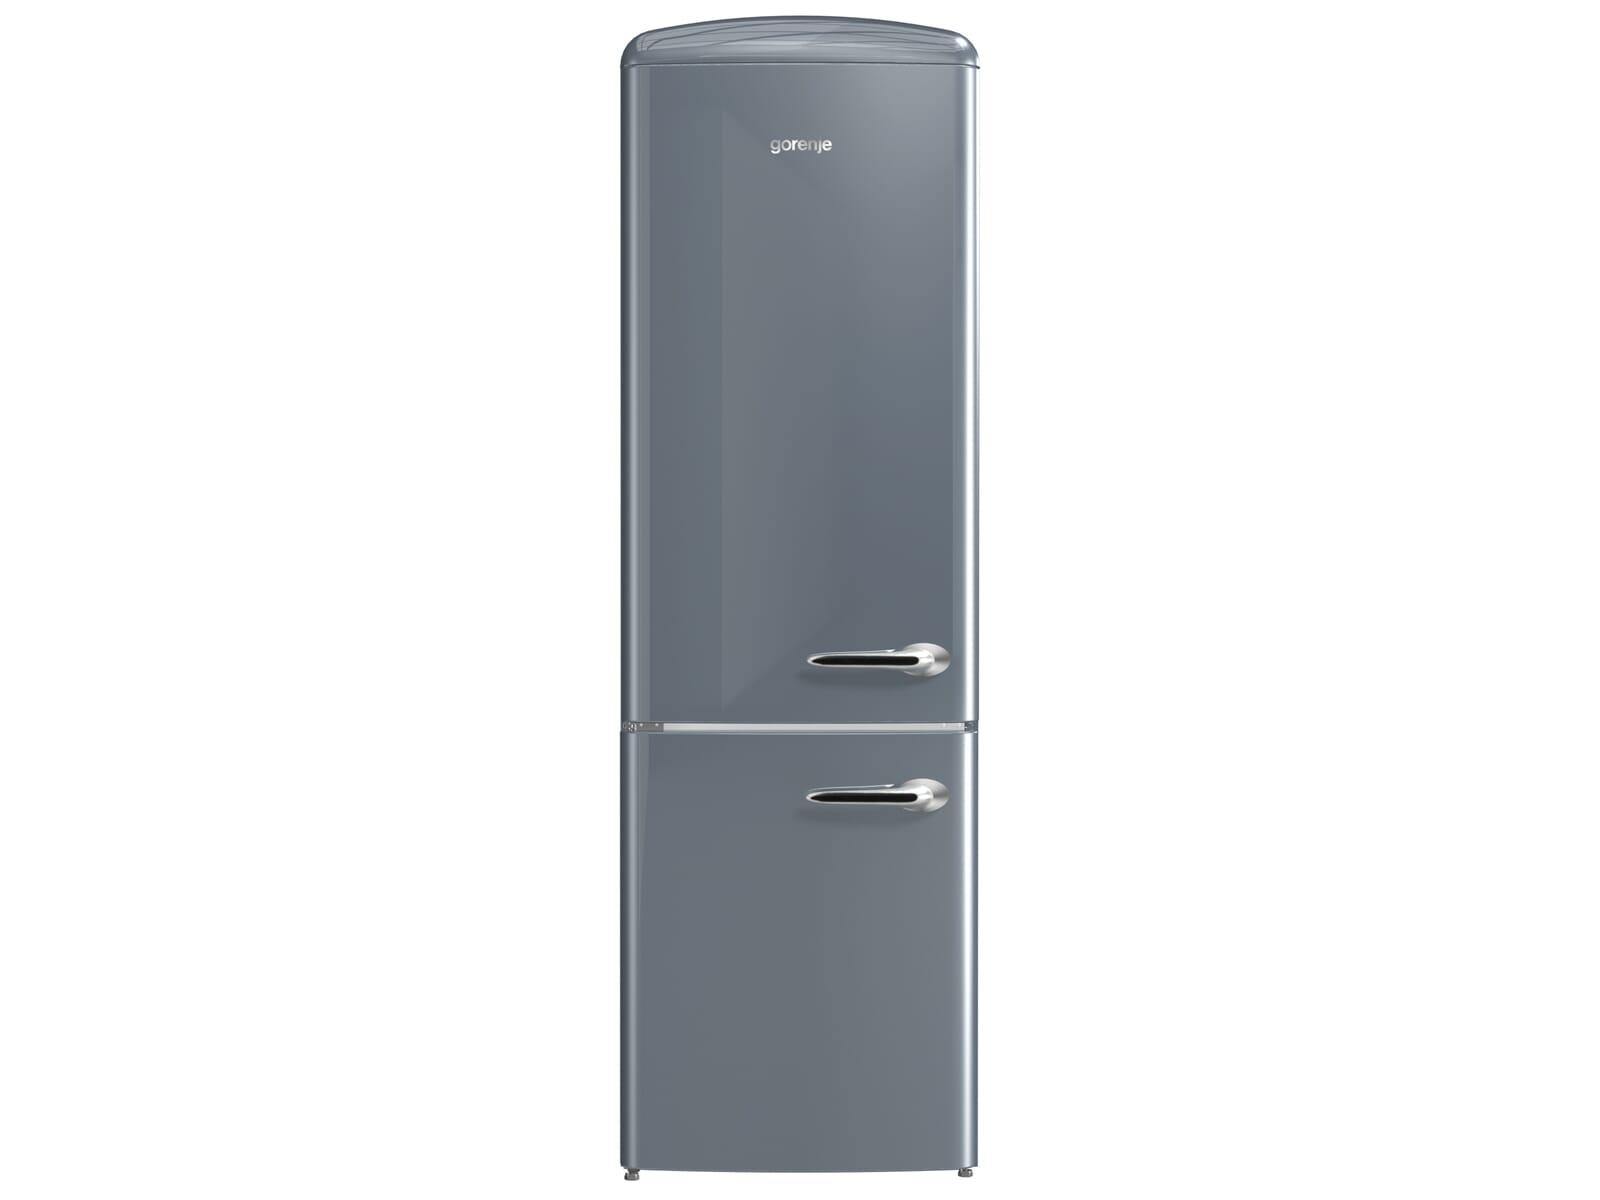 Gorenje Kühlschrank Ion Air : Gorenje ork l kühl gefrierkombination silver